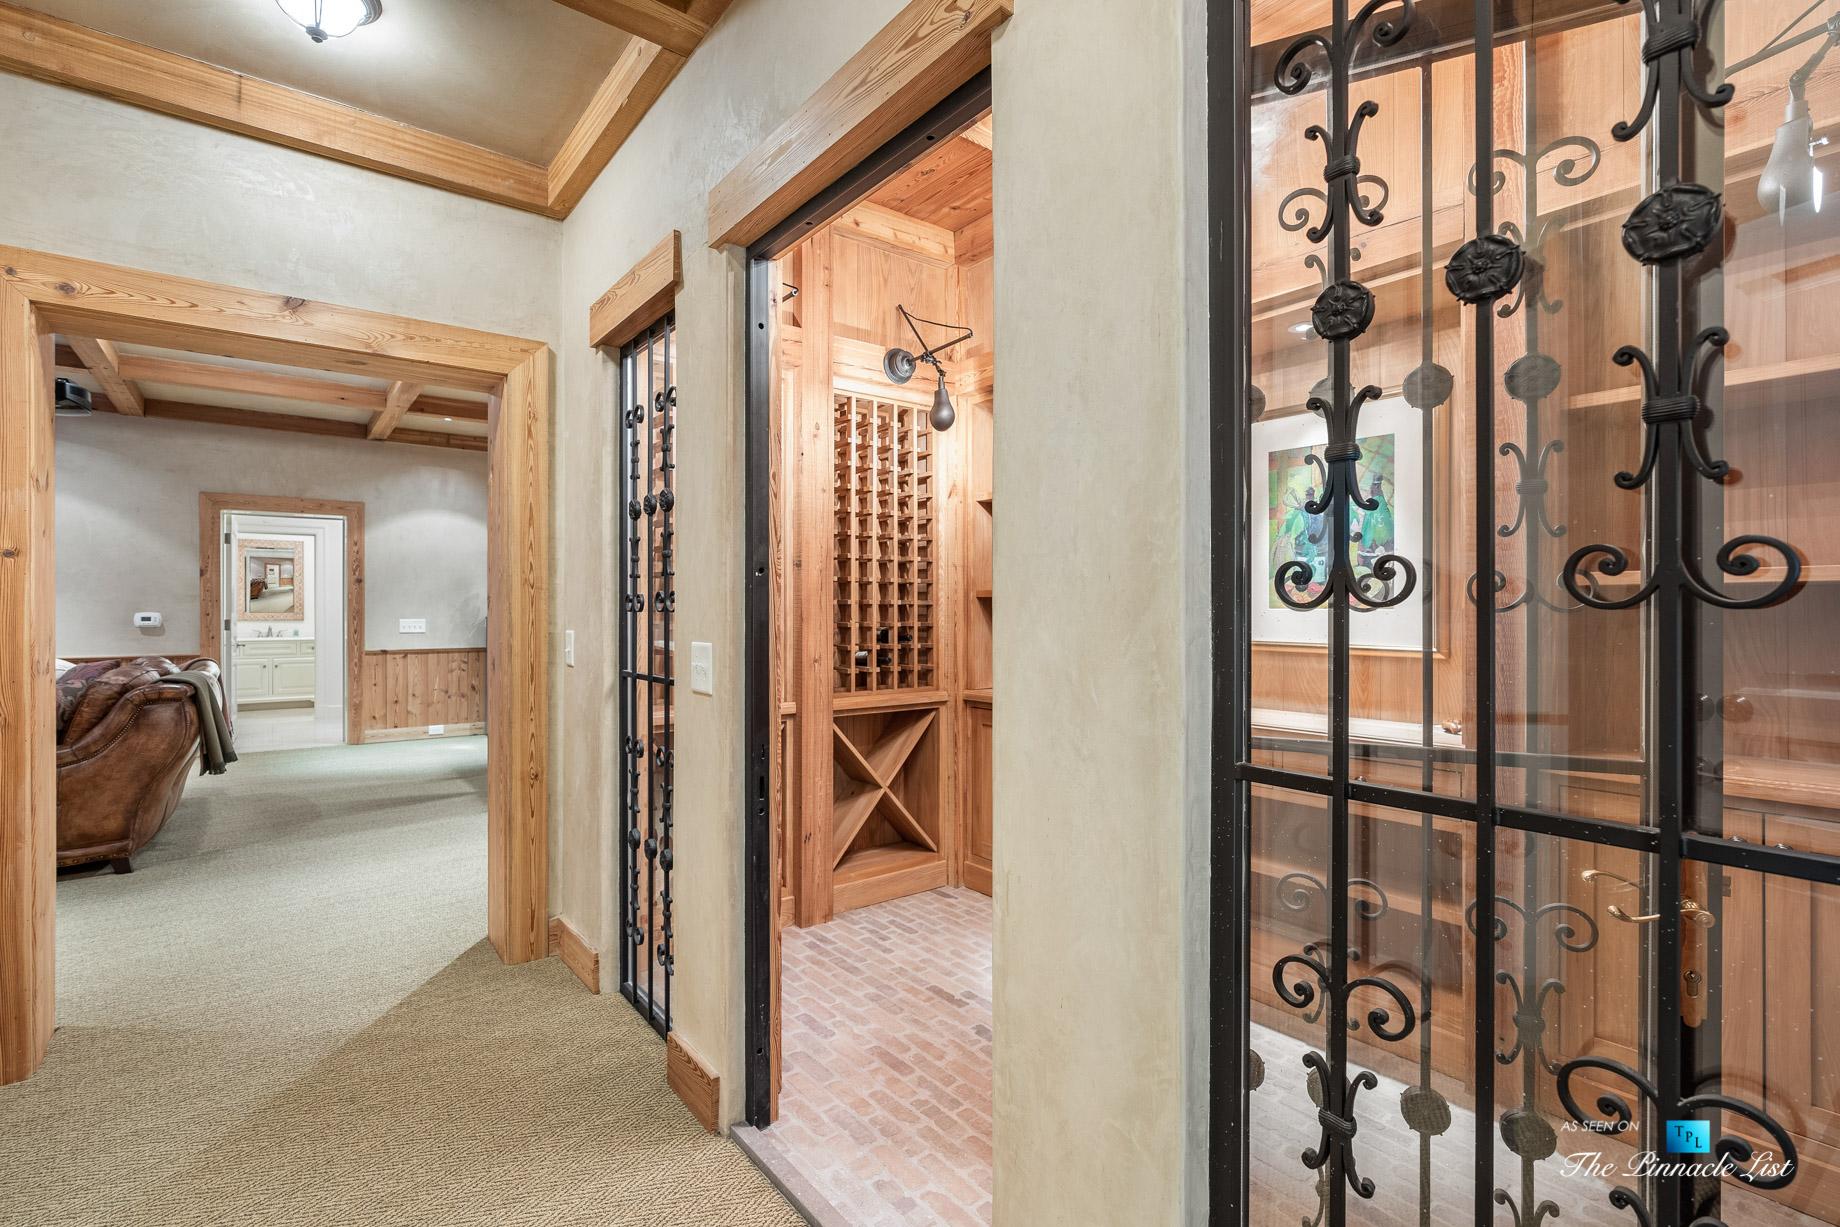 439 Blackland Rd NW, Atlanta, GA, USA - Wine Room - Luxury Real Estate - Tuxedo Park Mediterranean Mansion Home